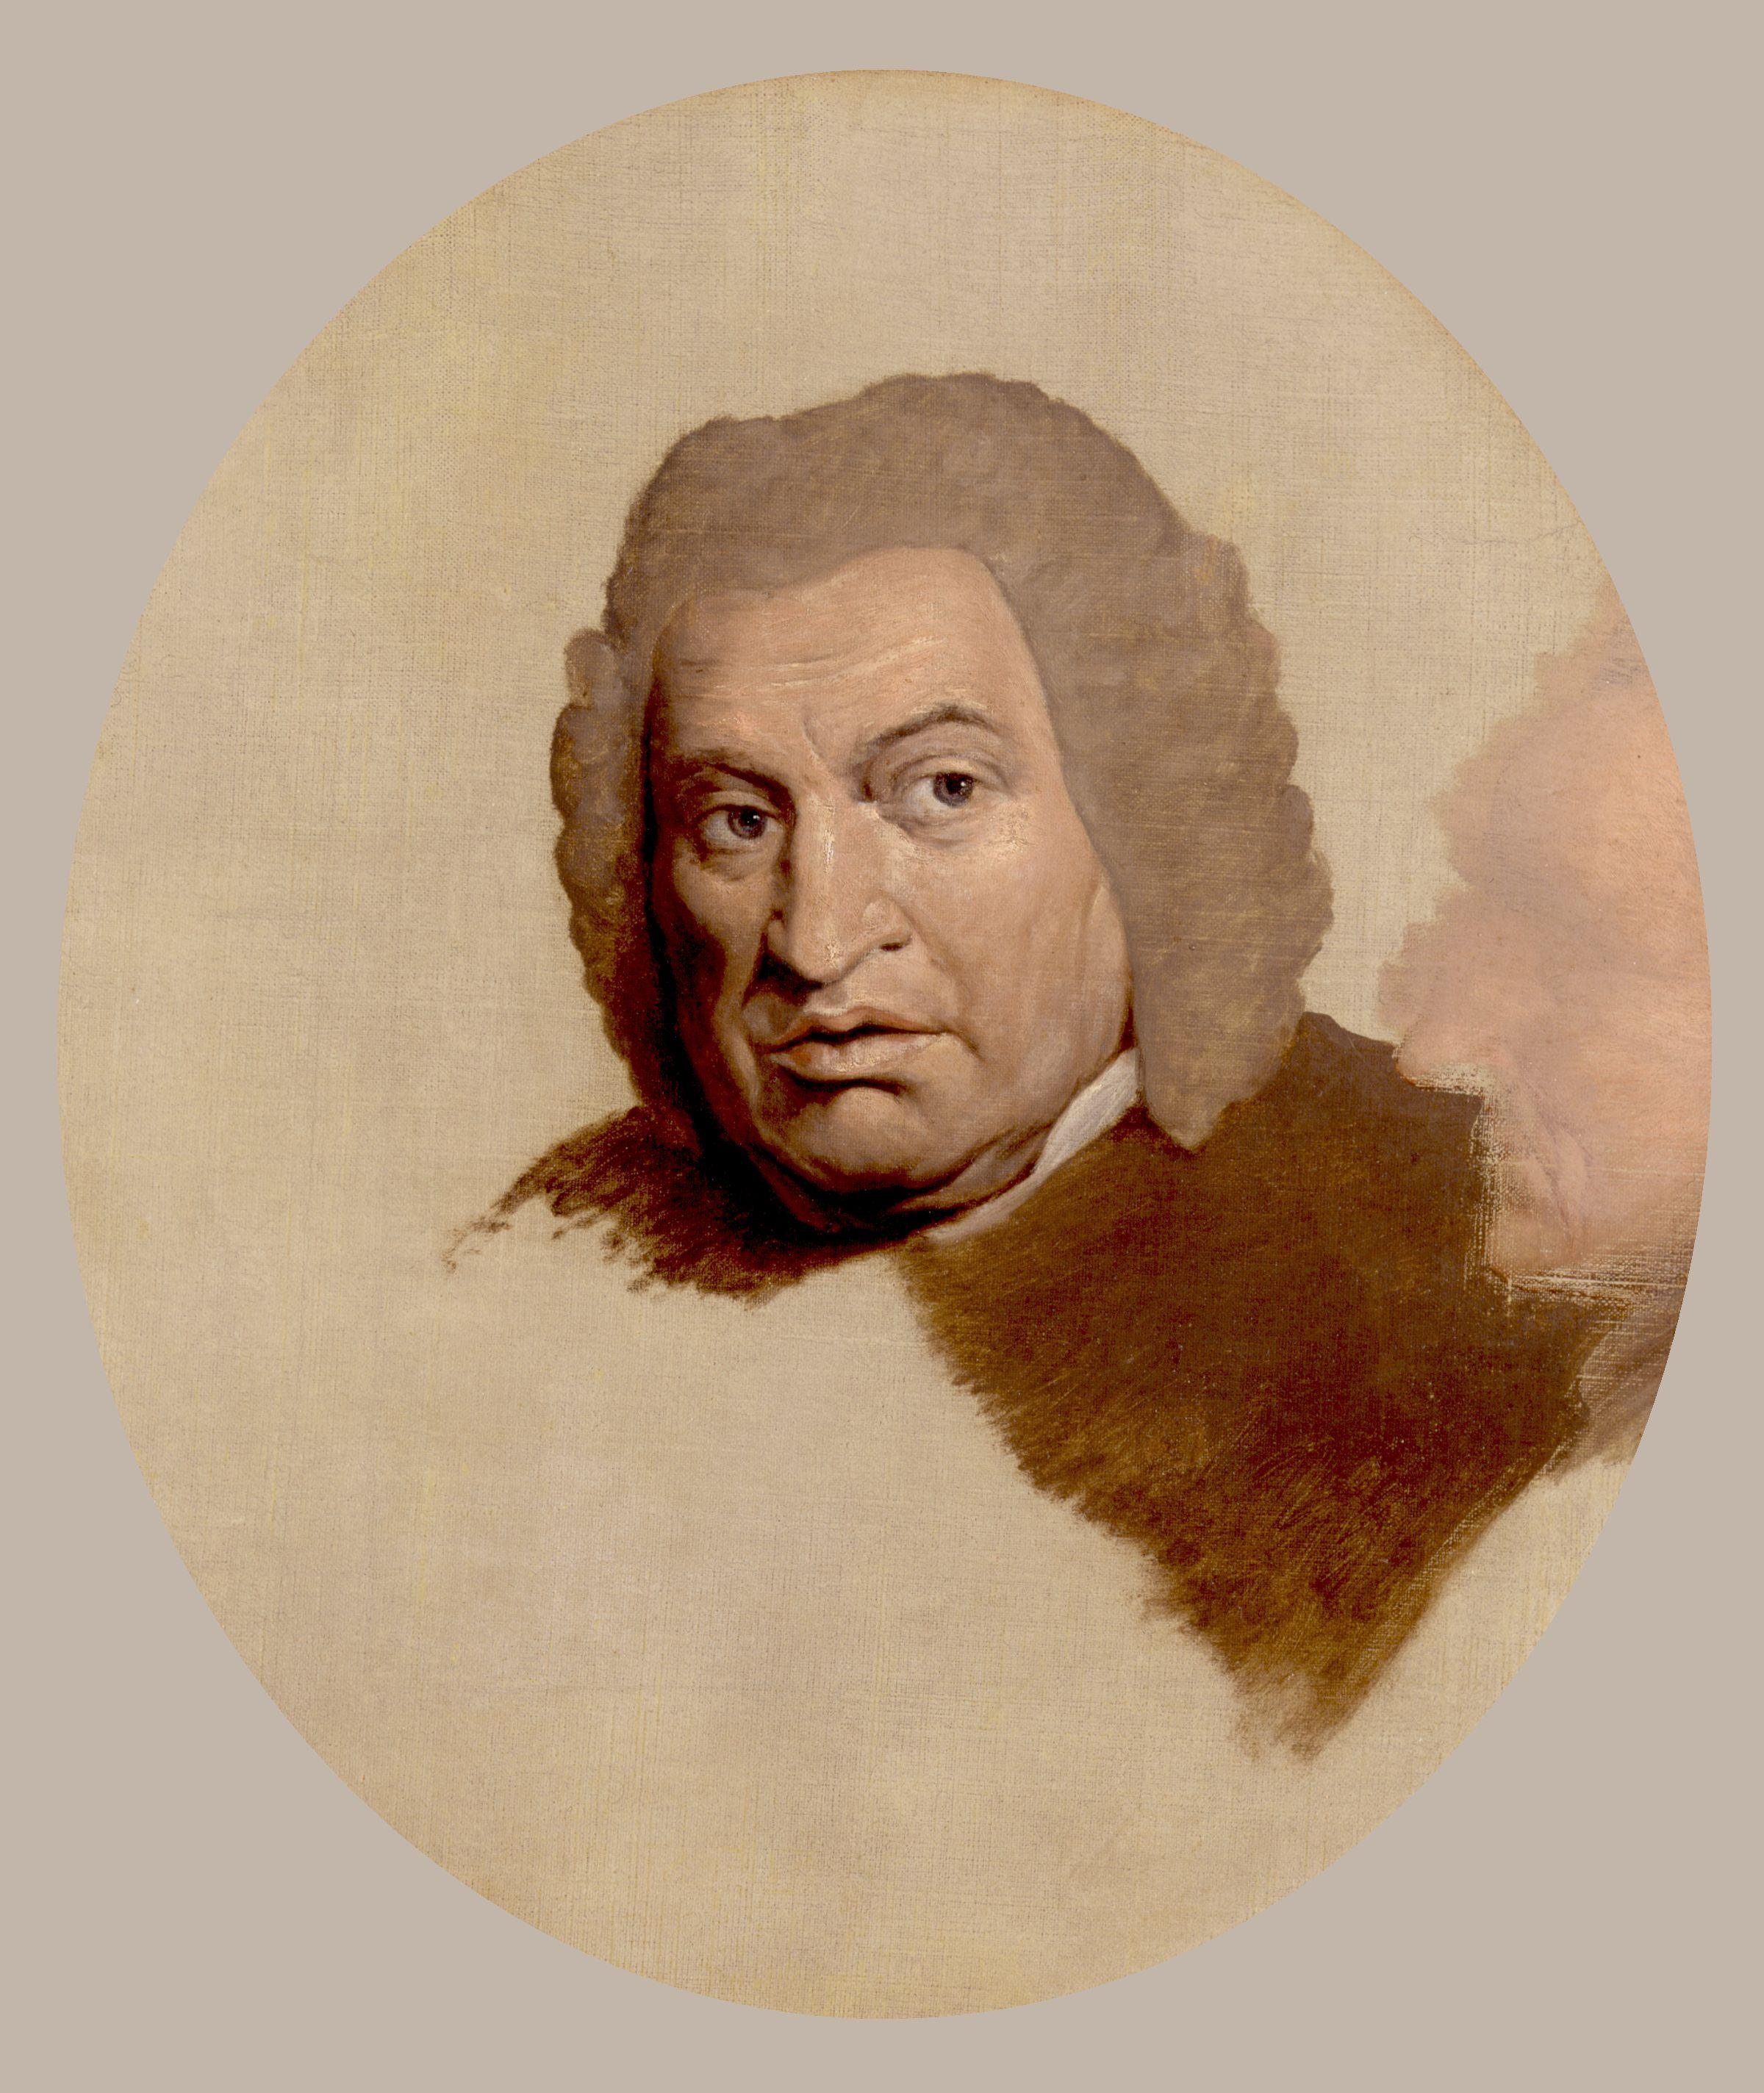 http://upload.wikimedia.org/wikipedia/commons/0/07/Samuel_Johnson_by_James_Barry.jpg